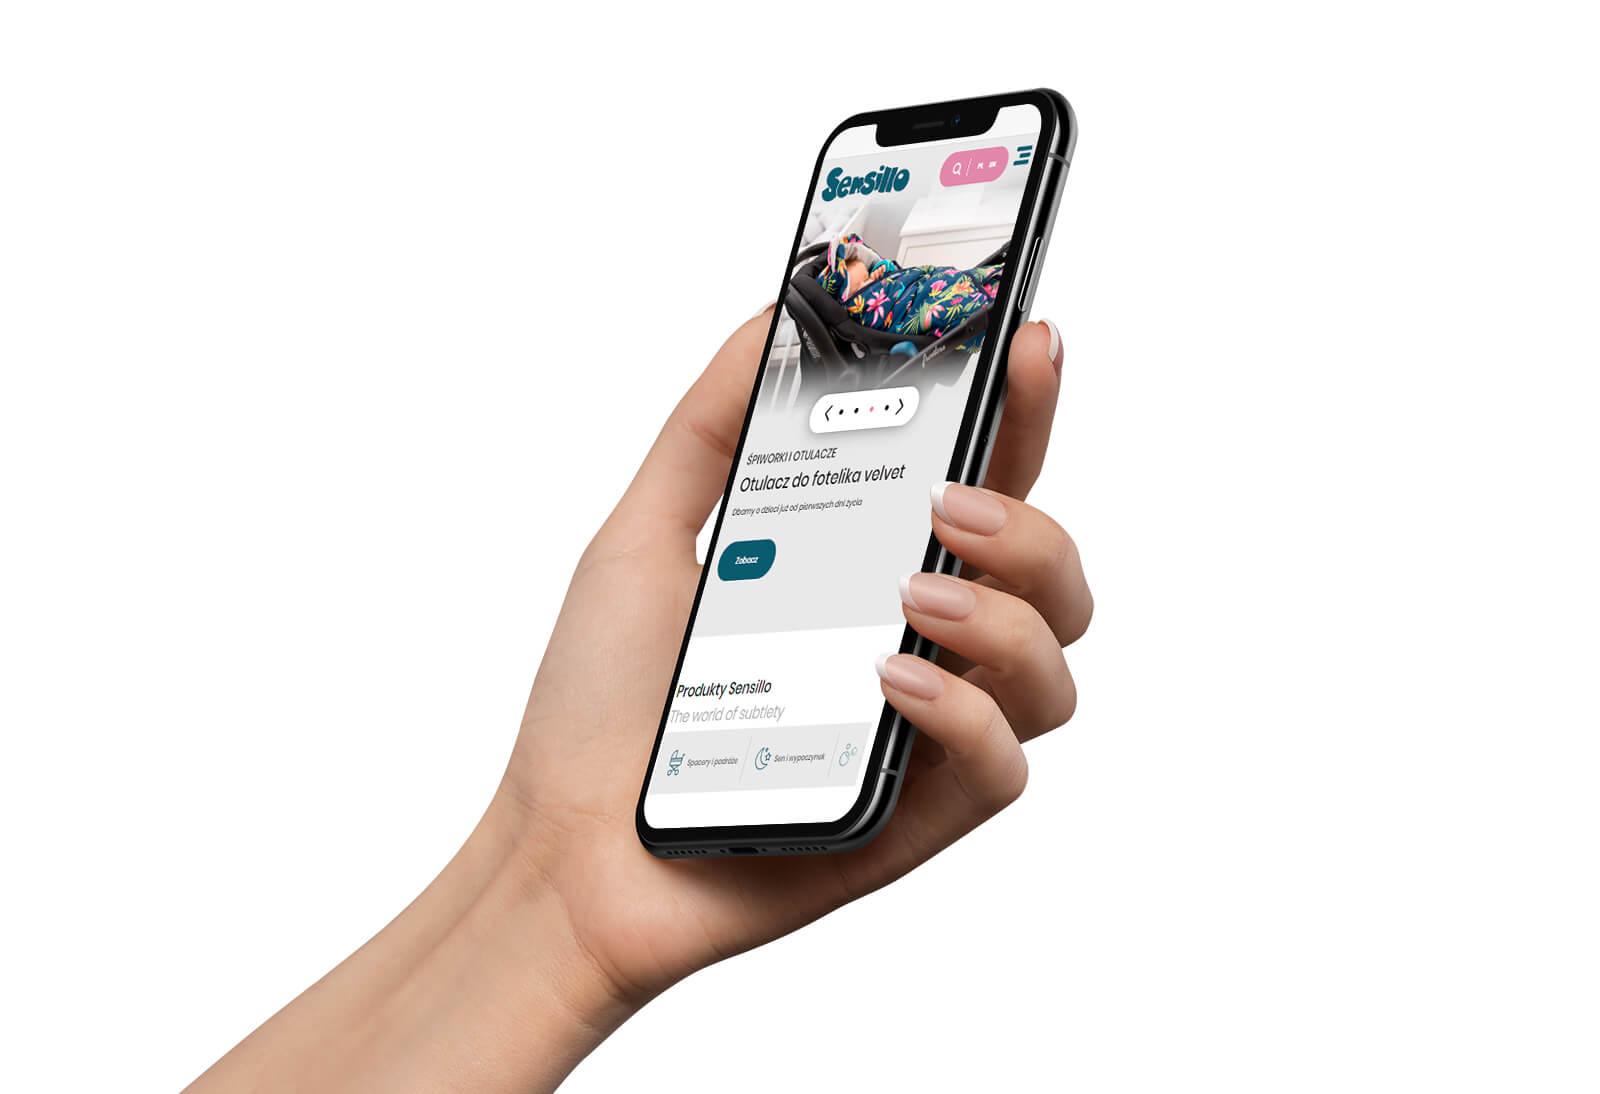 Sensillo - strona internetowa pokazana na telefonie